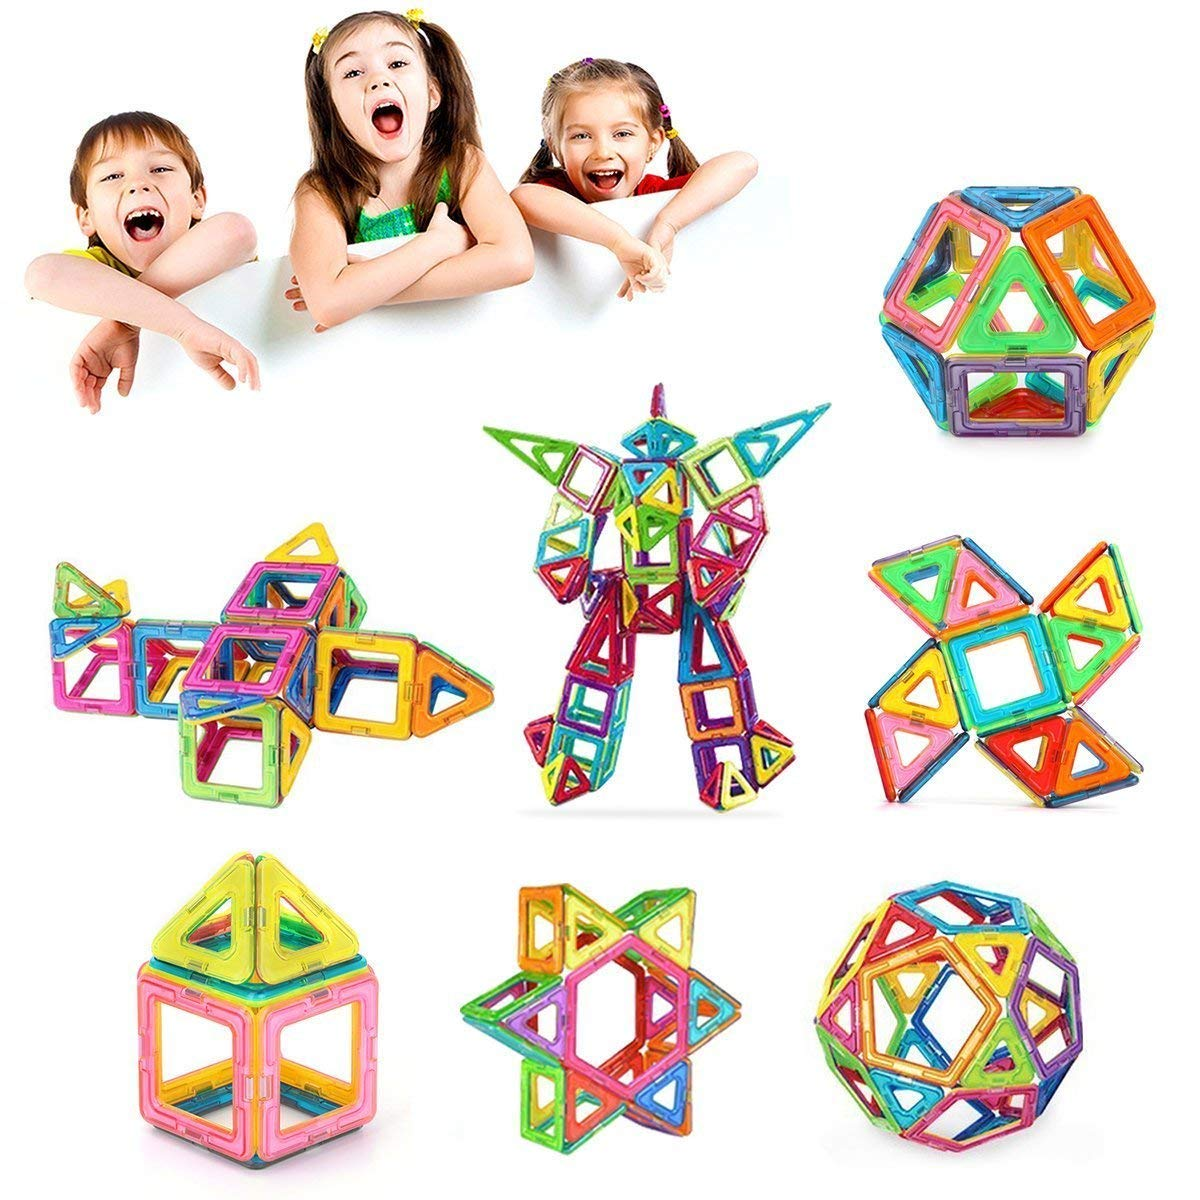 Morcare 76pcs Magnetic Blocks Magnetic Building Blocks Toys for Boys Girls, Magnet Tiles Molding Kits for Kids by Morcare (Image #2)